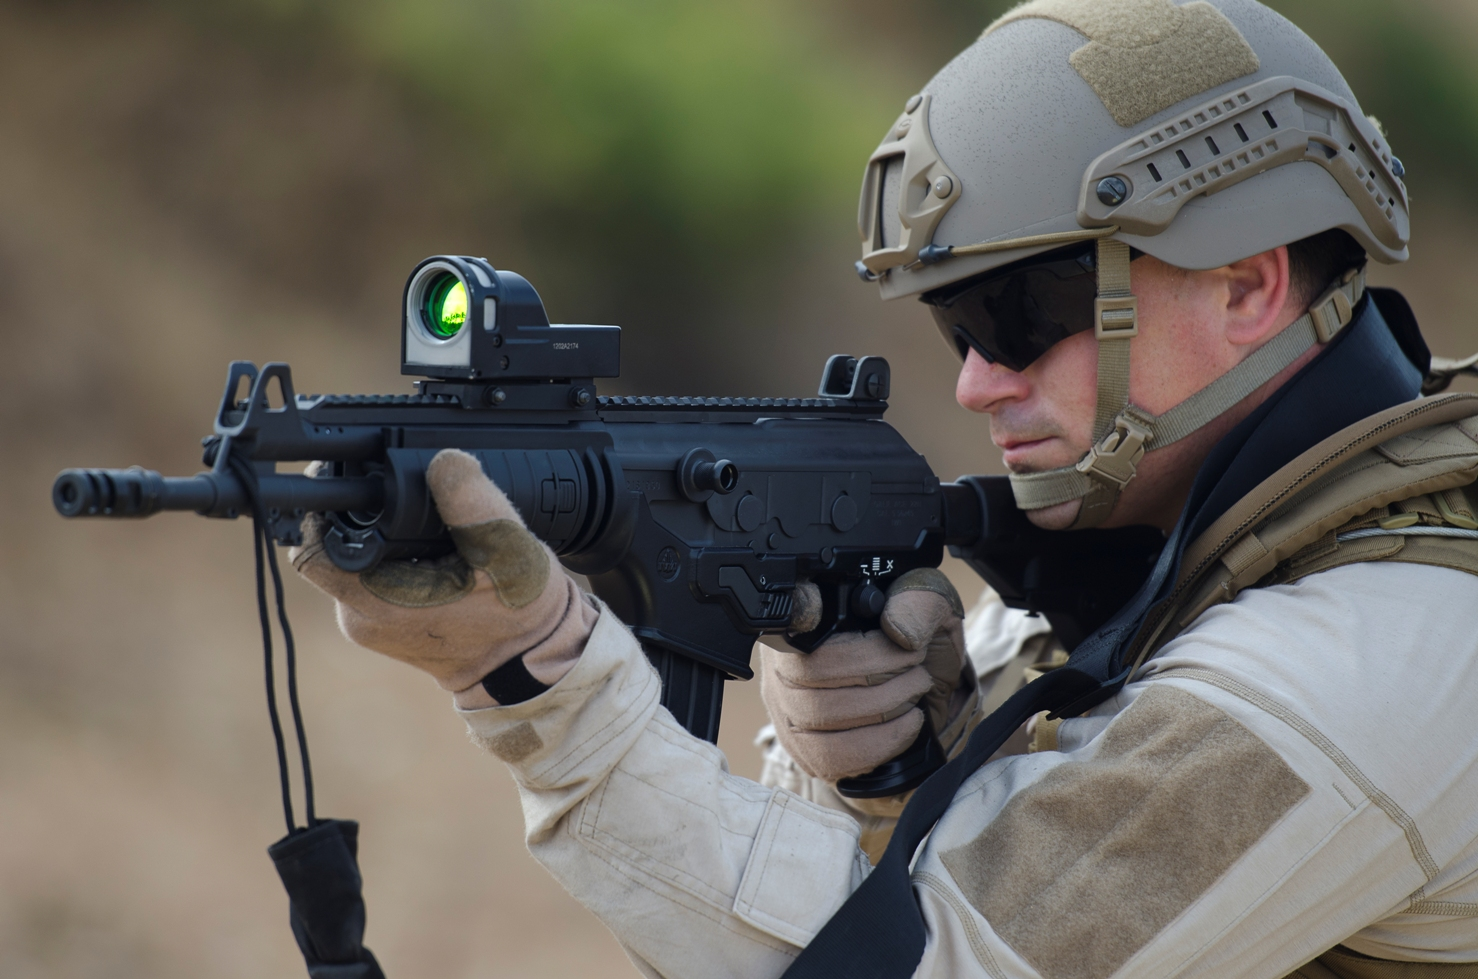 Exército chileno finalmente seleciona novo fuzil de assalto